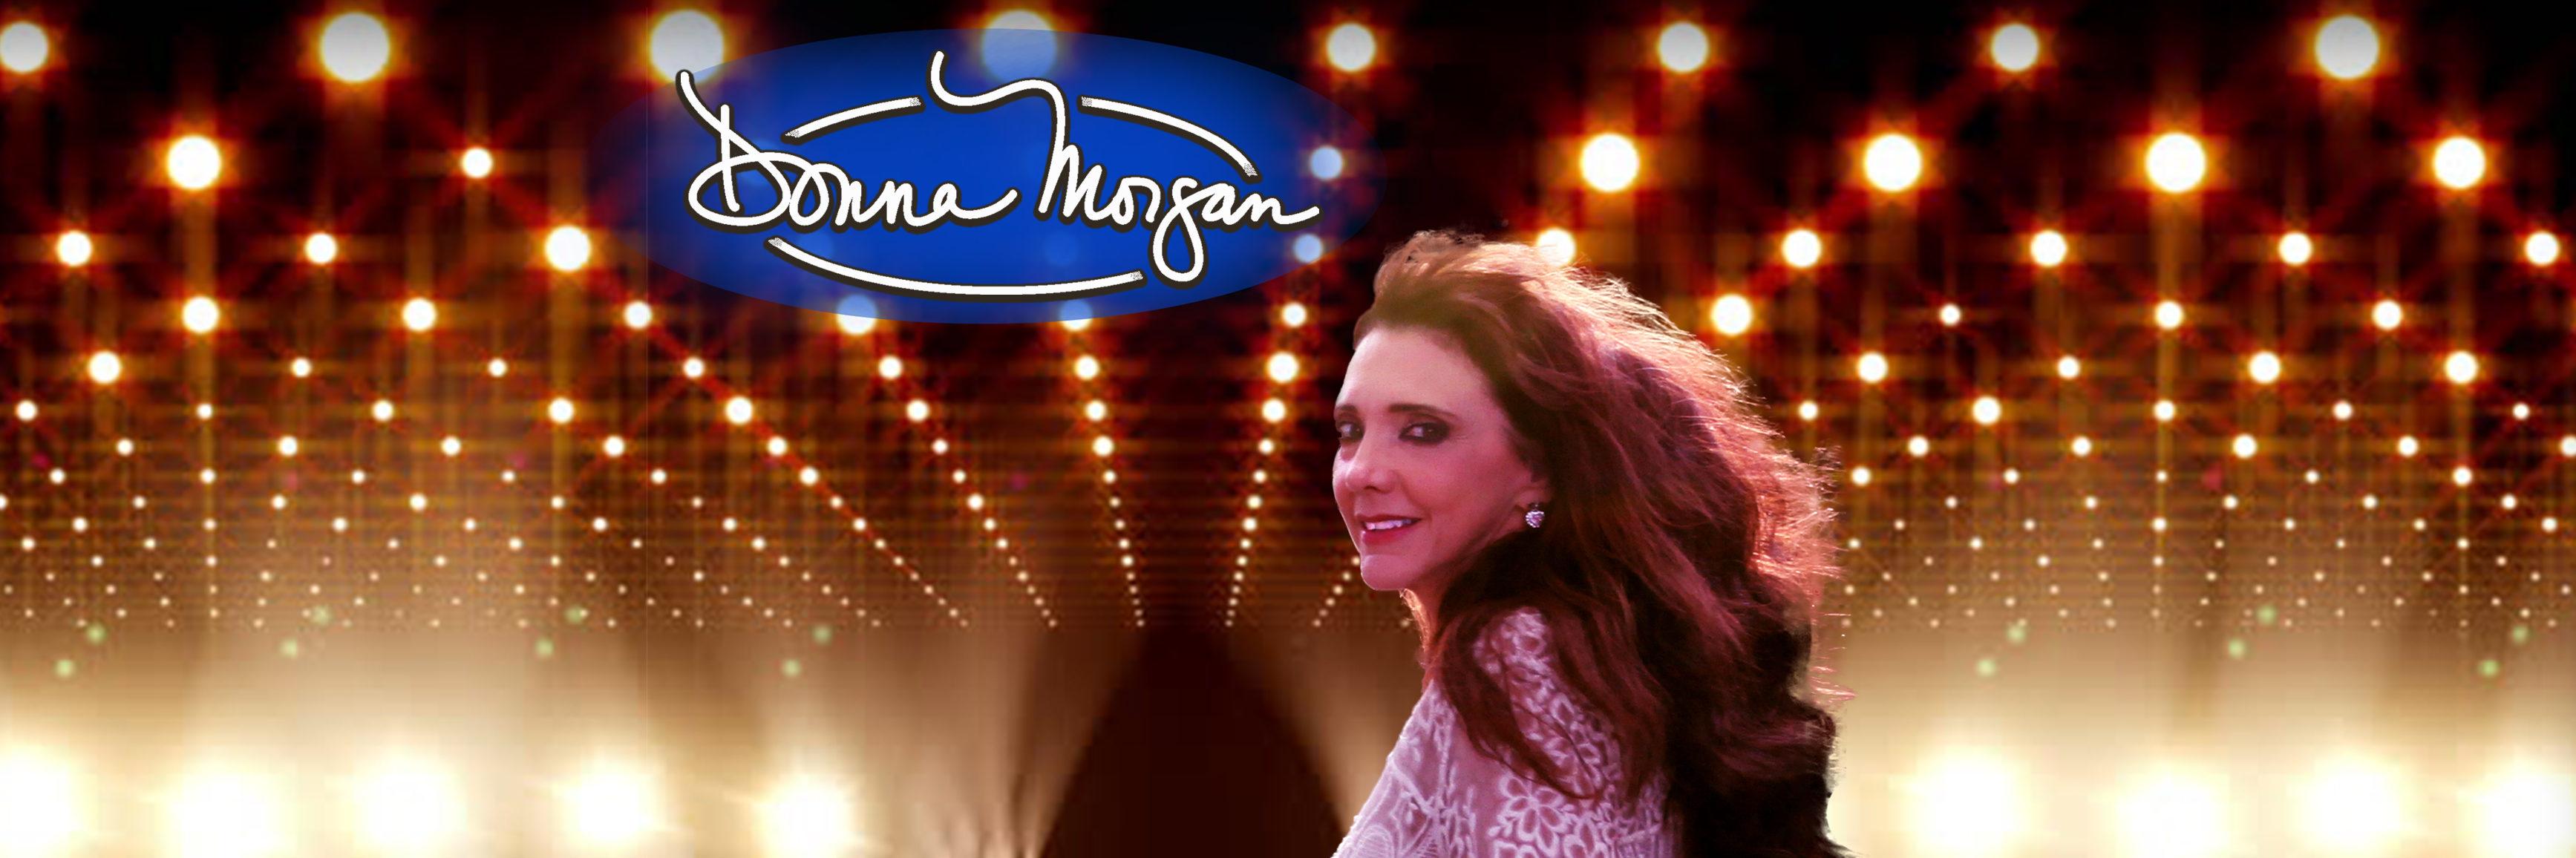 Donna Morgan Music